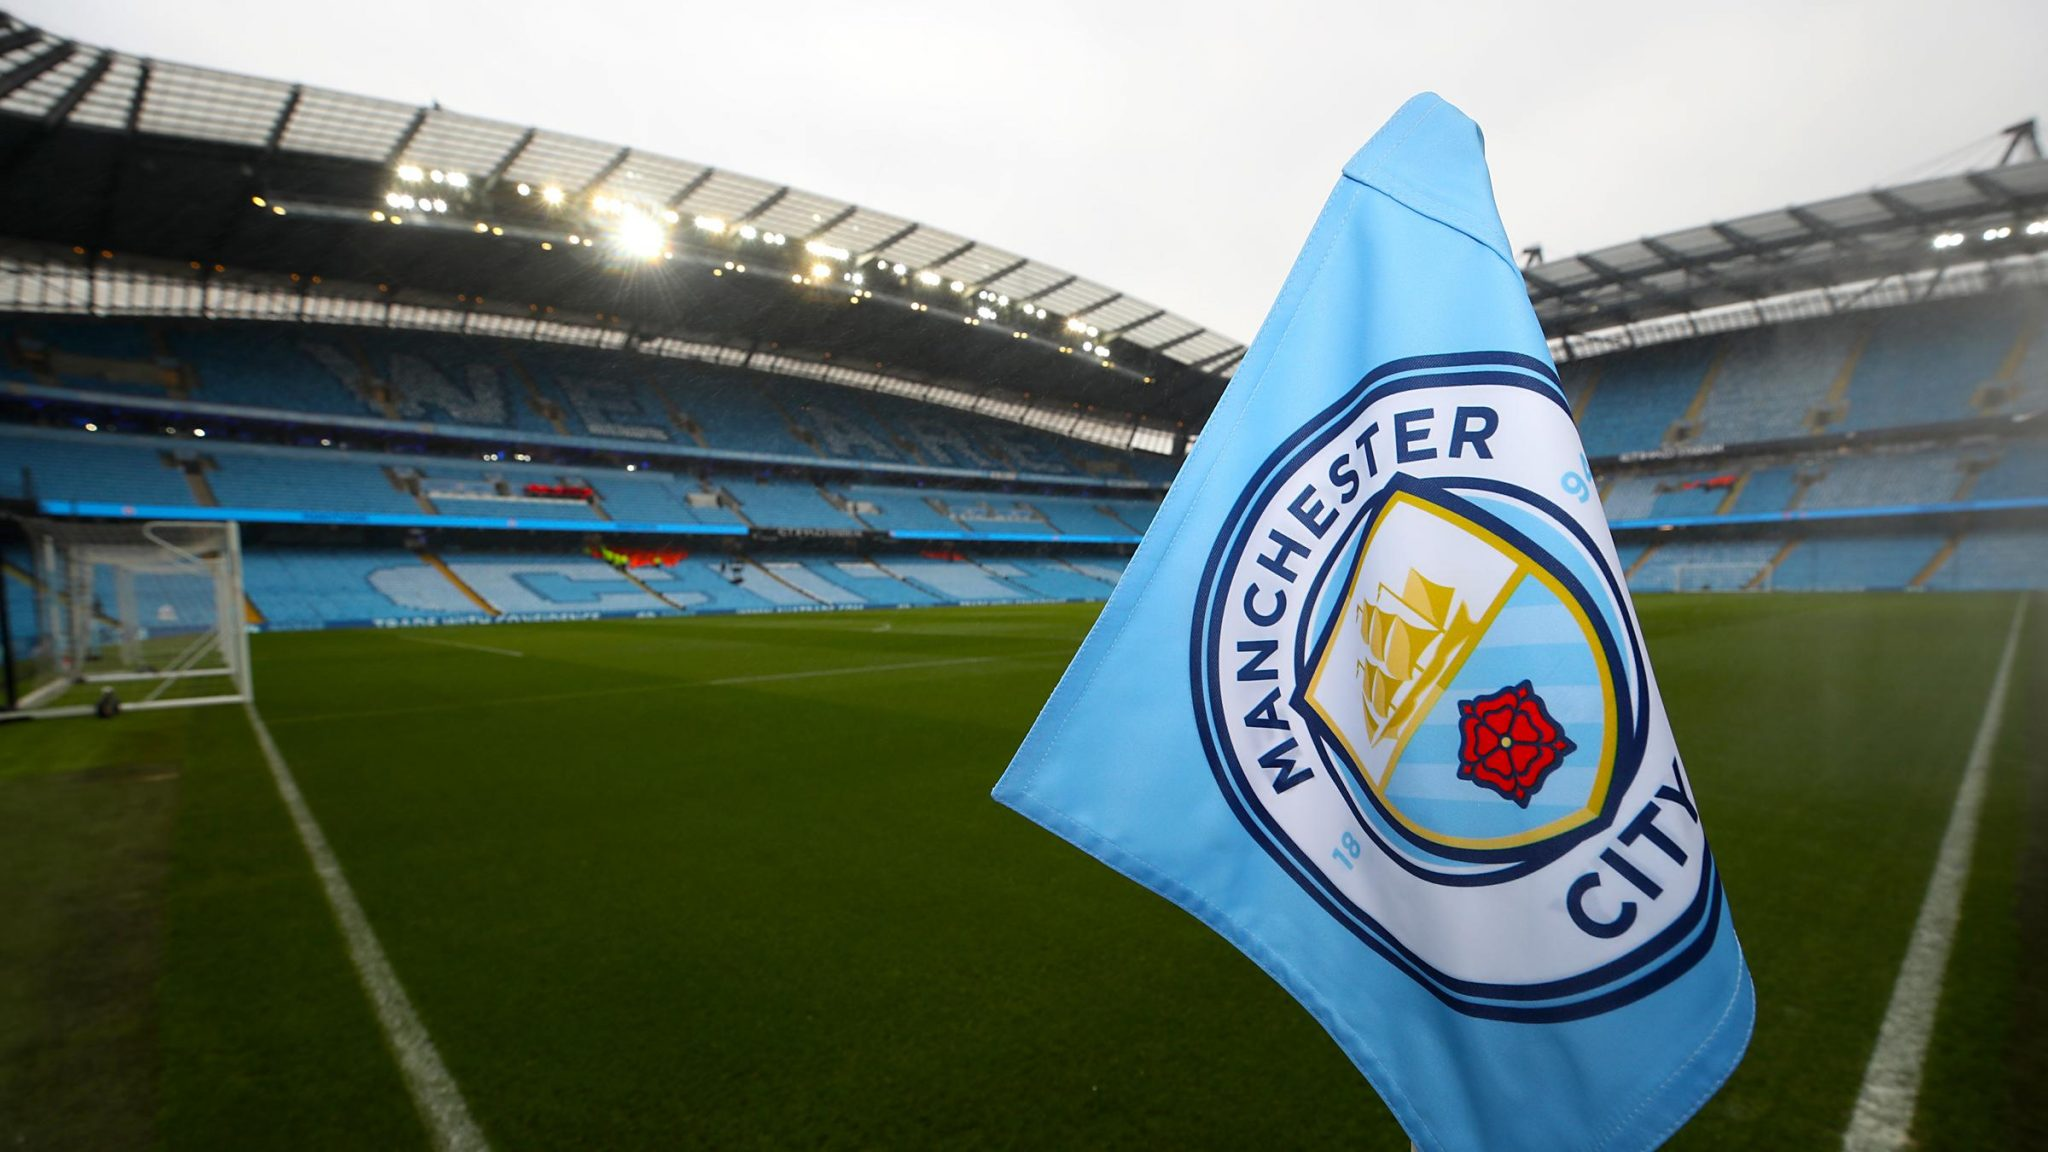 Manchester City ar putea fi exclusă din Champions League. Un oficial de la UEFA a confirmat